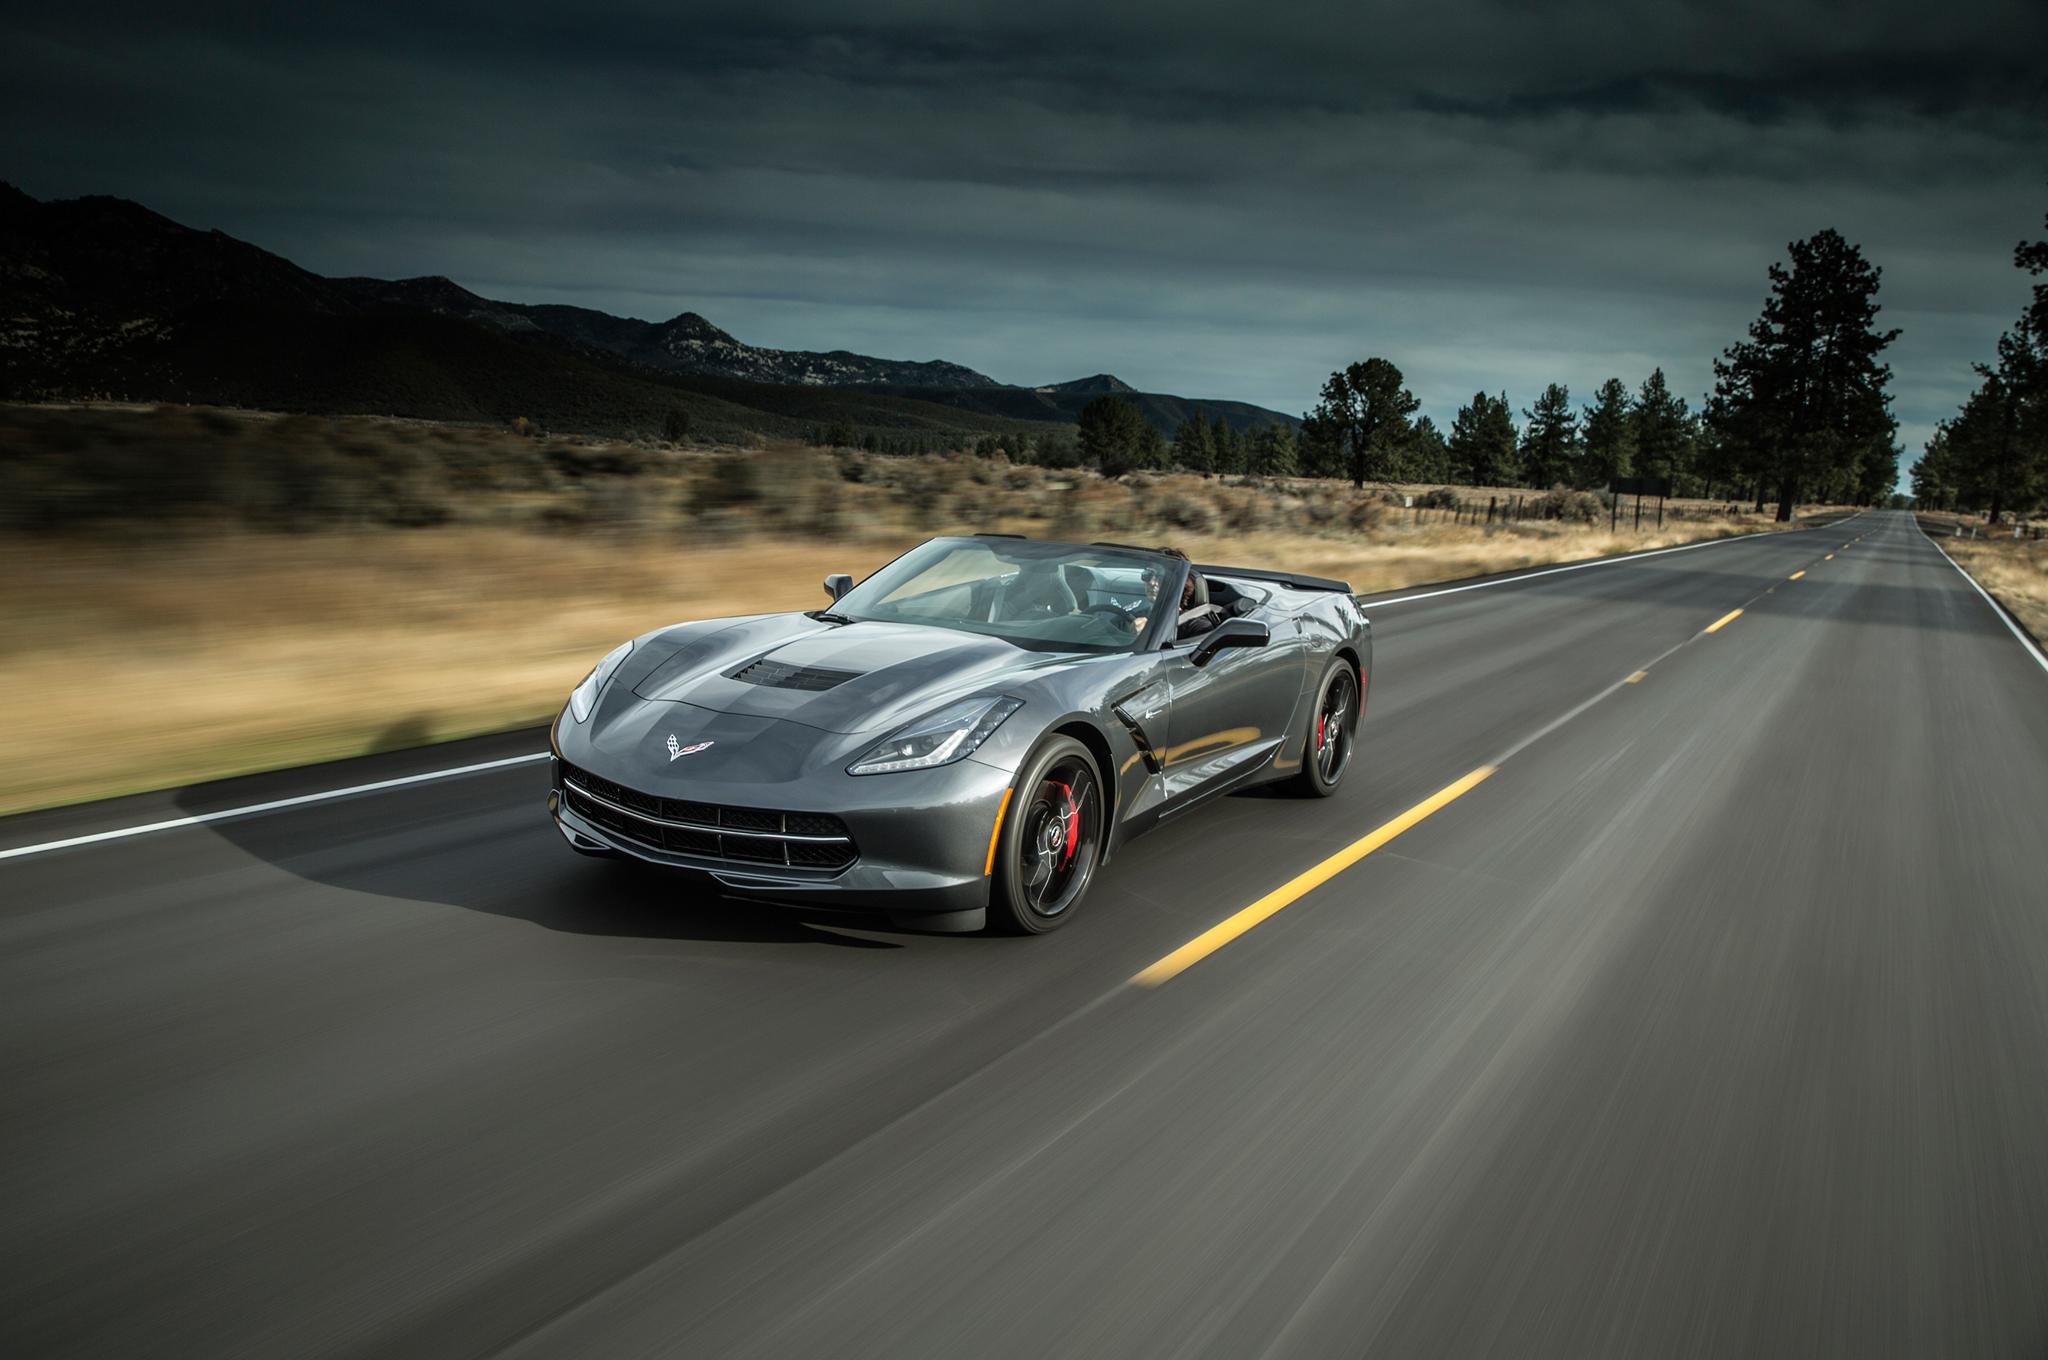 2015 corvette stingray convertible photo wallpaper download